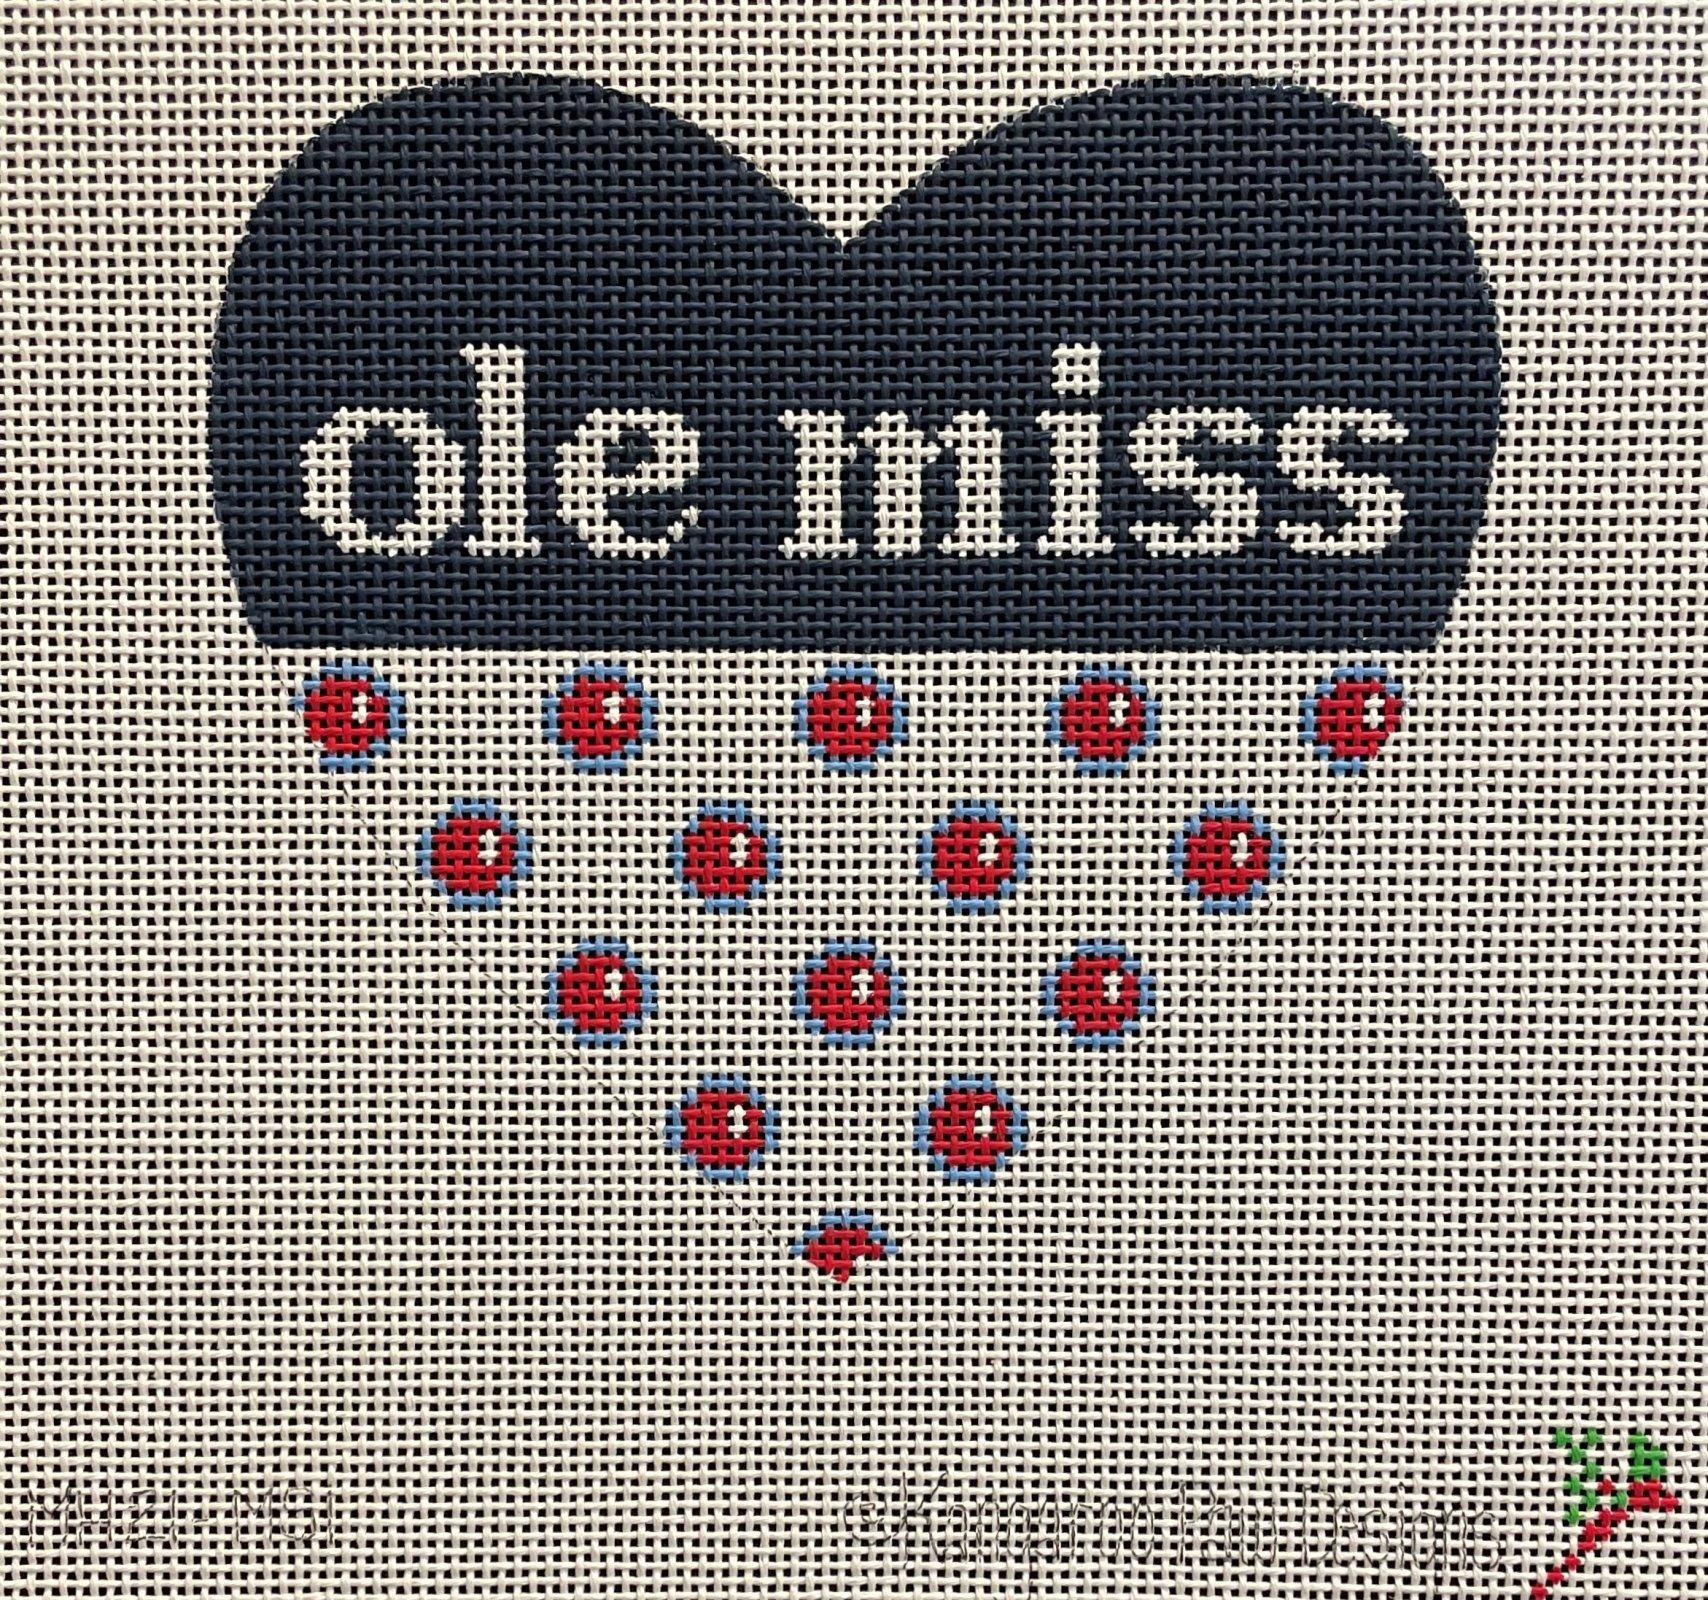 Ole Miss Heart